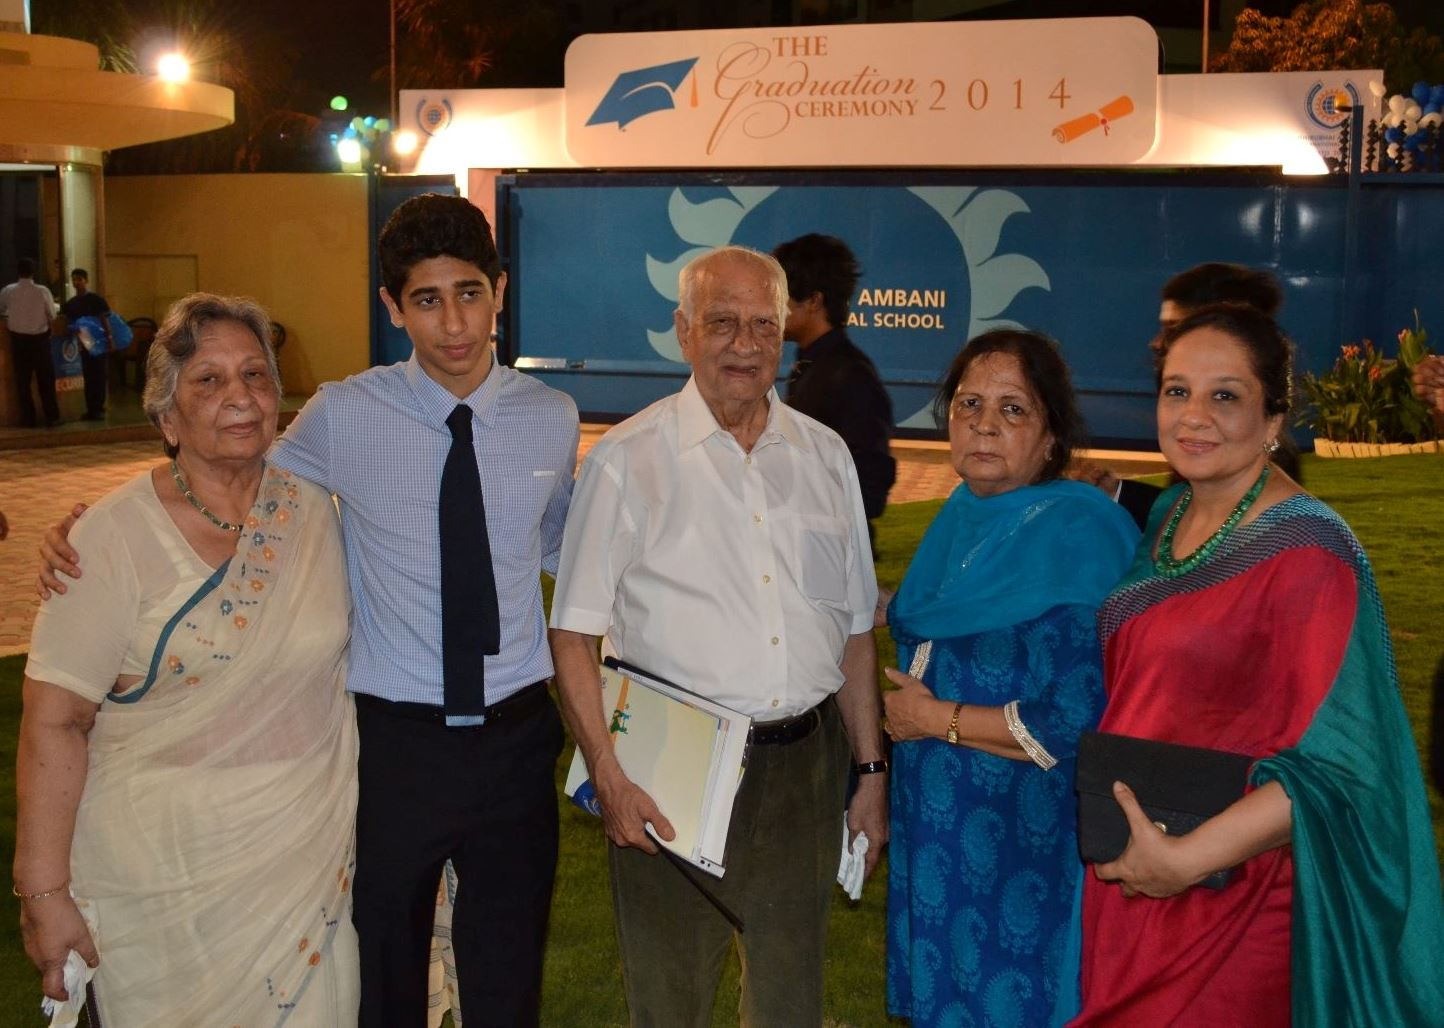 Vihaan Samat at the graduation ceremony of Dhirubhai Ambani International School (2014)